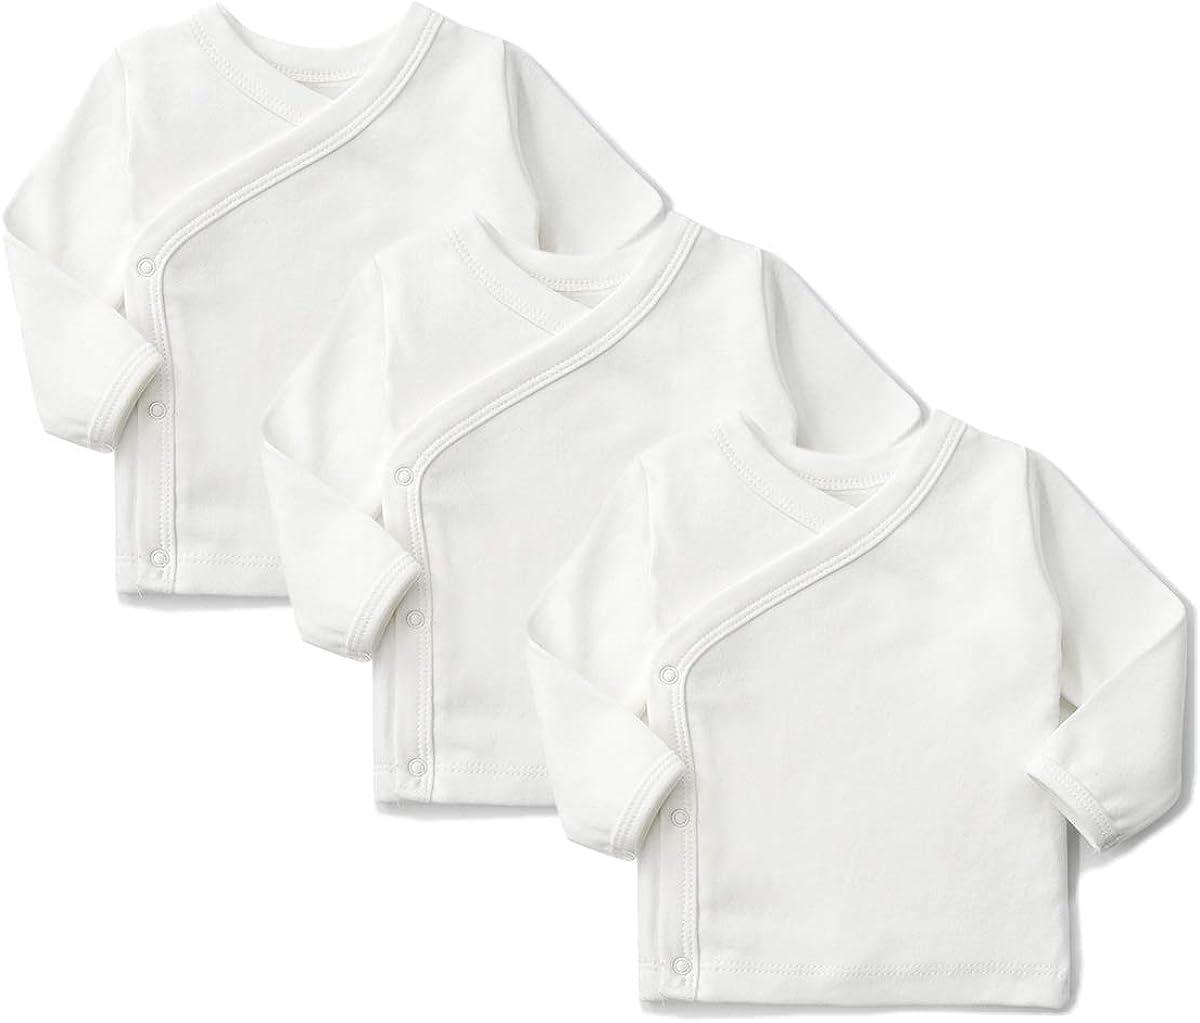 SYCLZ Unisex-Baby 100% Cotton Long Sleeve Side-Snap Shirts Soild Color Kimono Tees 0-12M (6-12M, White/3)